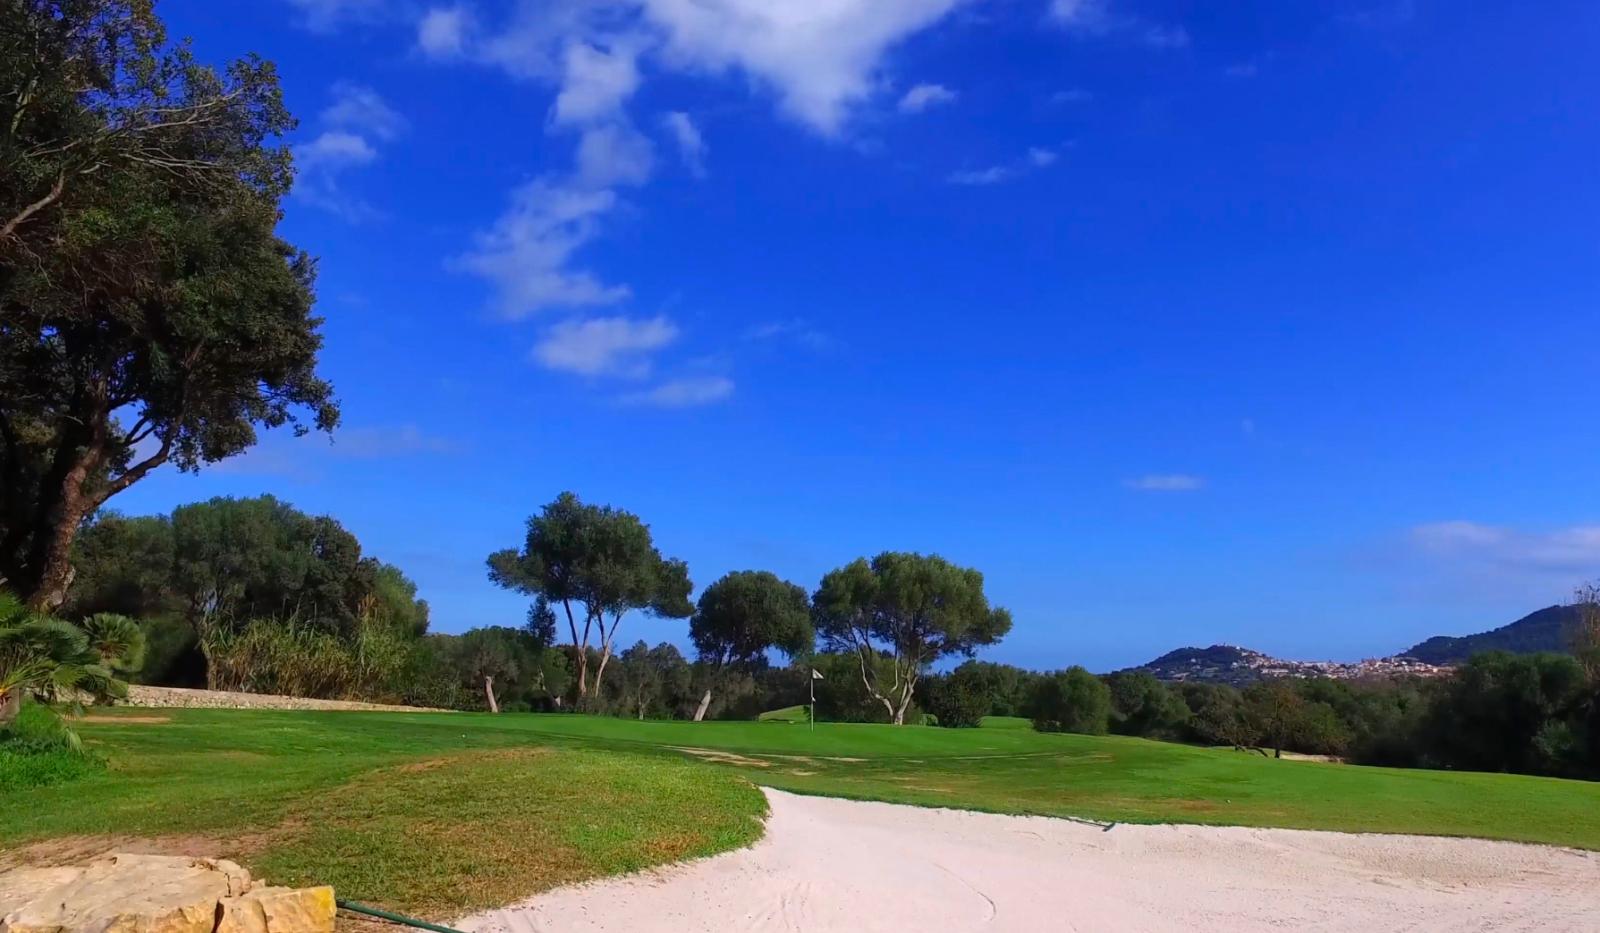 Capdepera Mallorca GolfnStyle - GOLF'n'STYLE - Silas - Capdepera - Mallorca